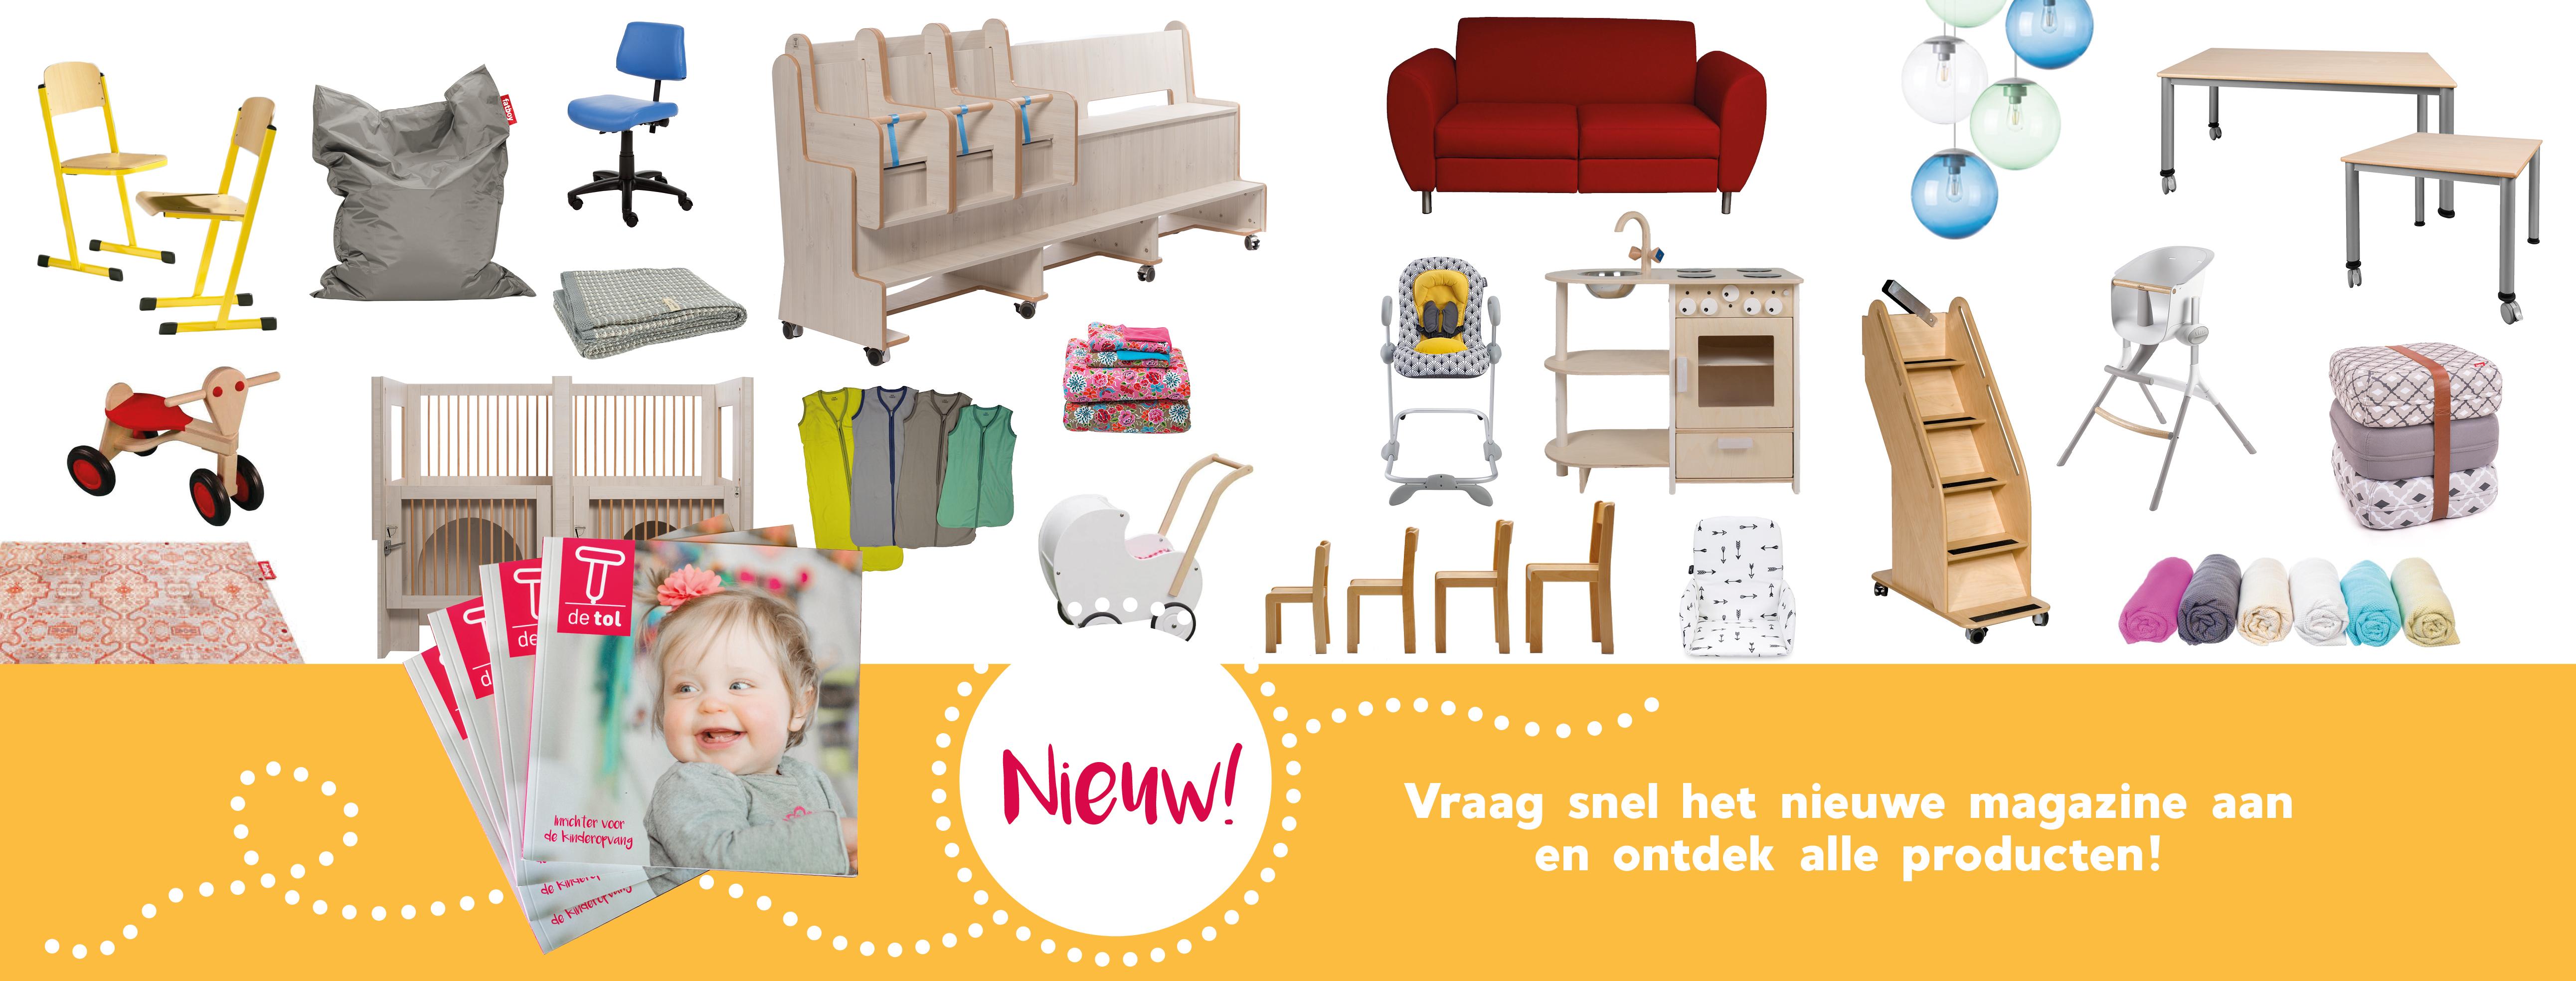 http://www.de-tol.nl/wp-content/uploads/DT_WEBBANNER_MAGAZINE_04.jpg